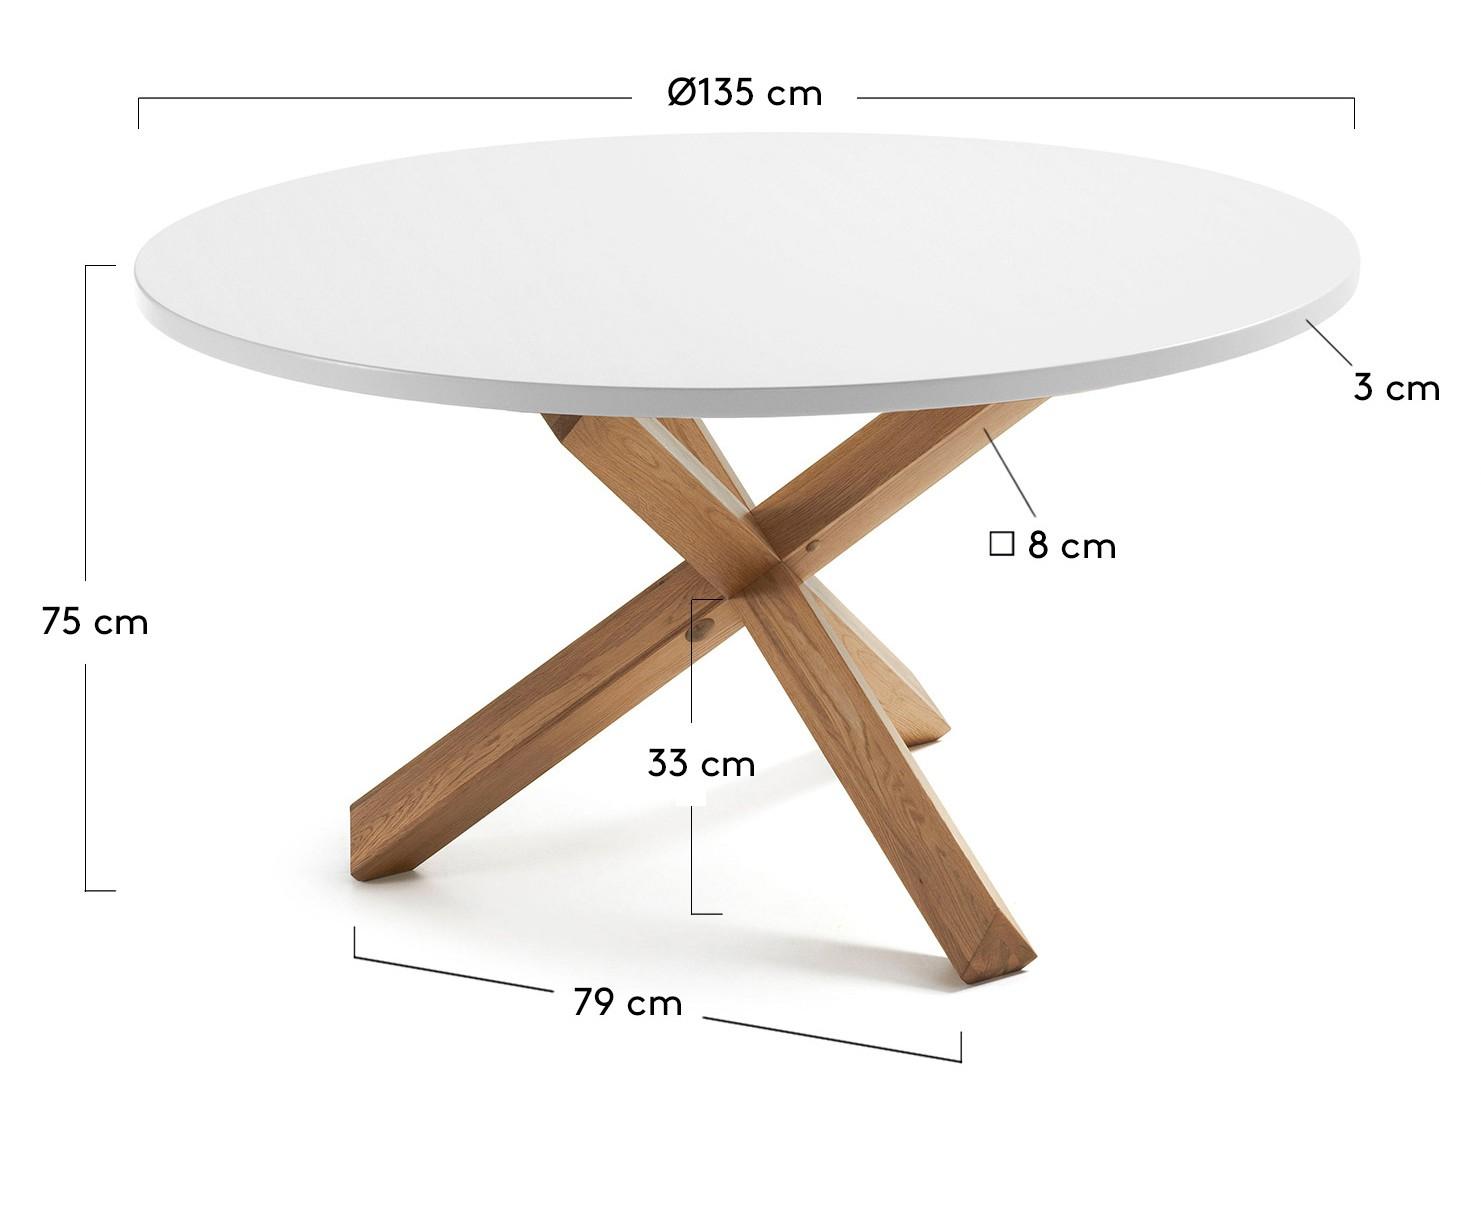 Diámetro de 135 cm.